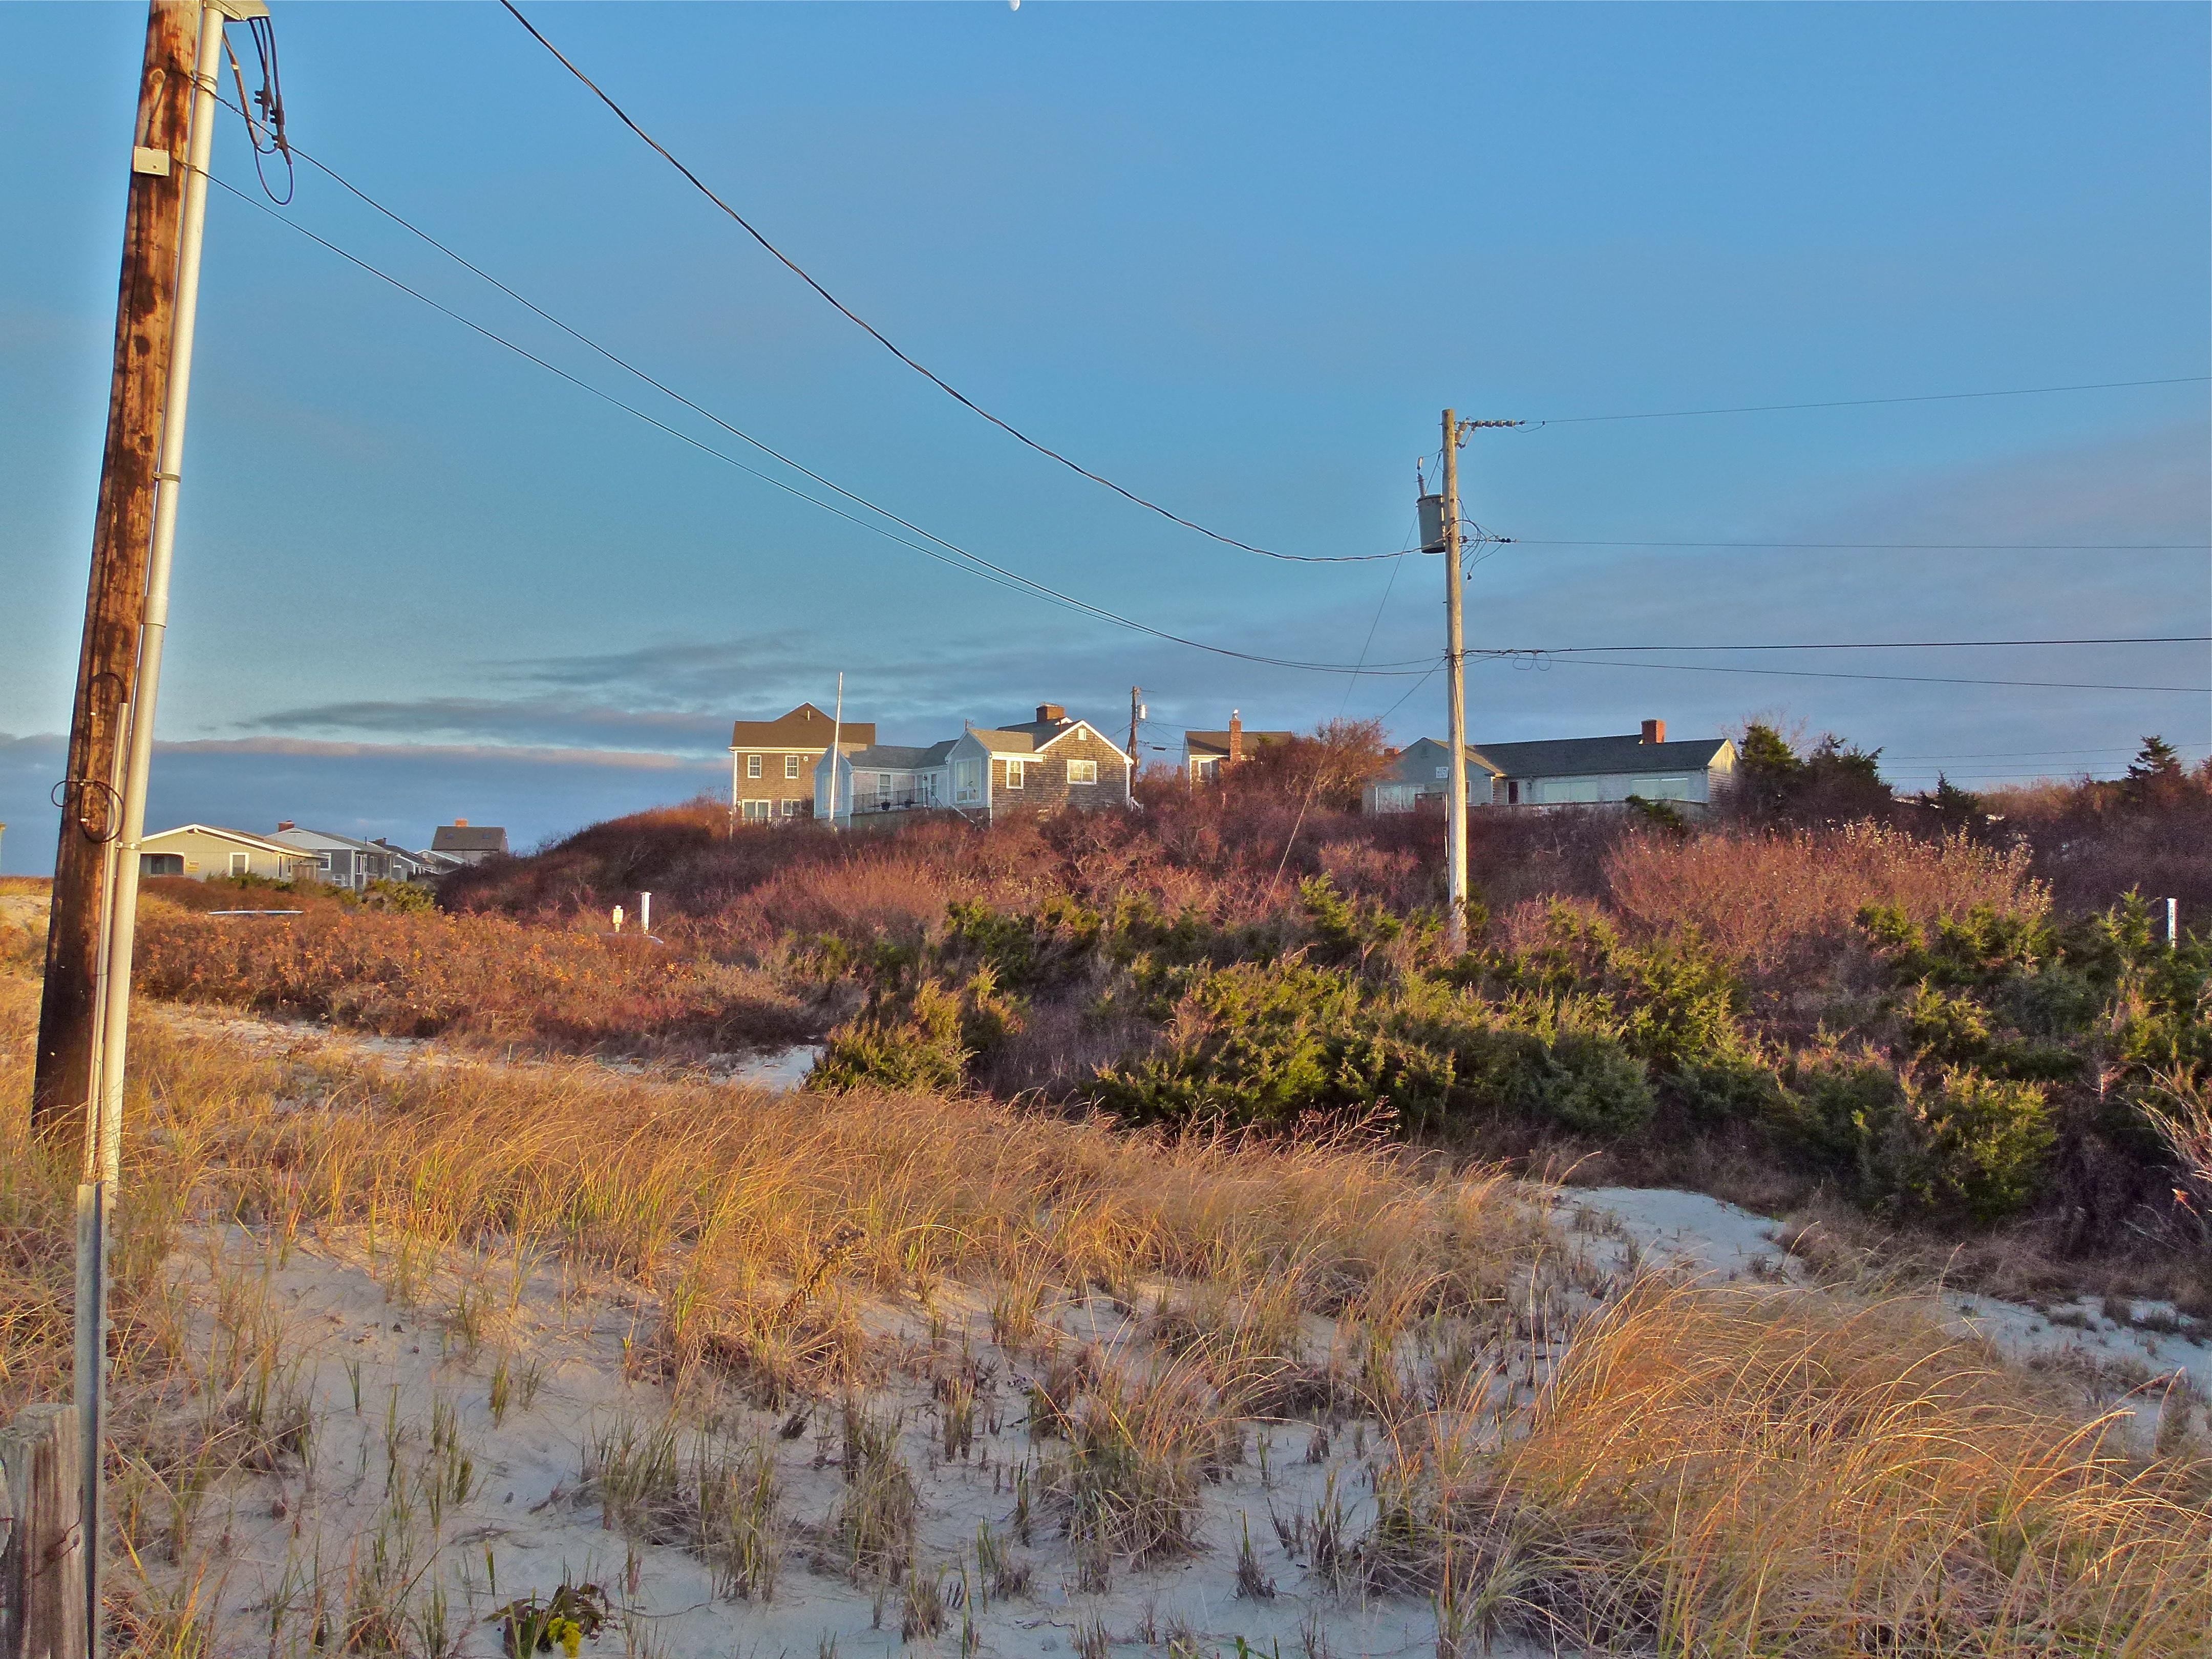 East Sandwich, Cape Cod, Massachusetts (Photo: Margarita Persico)